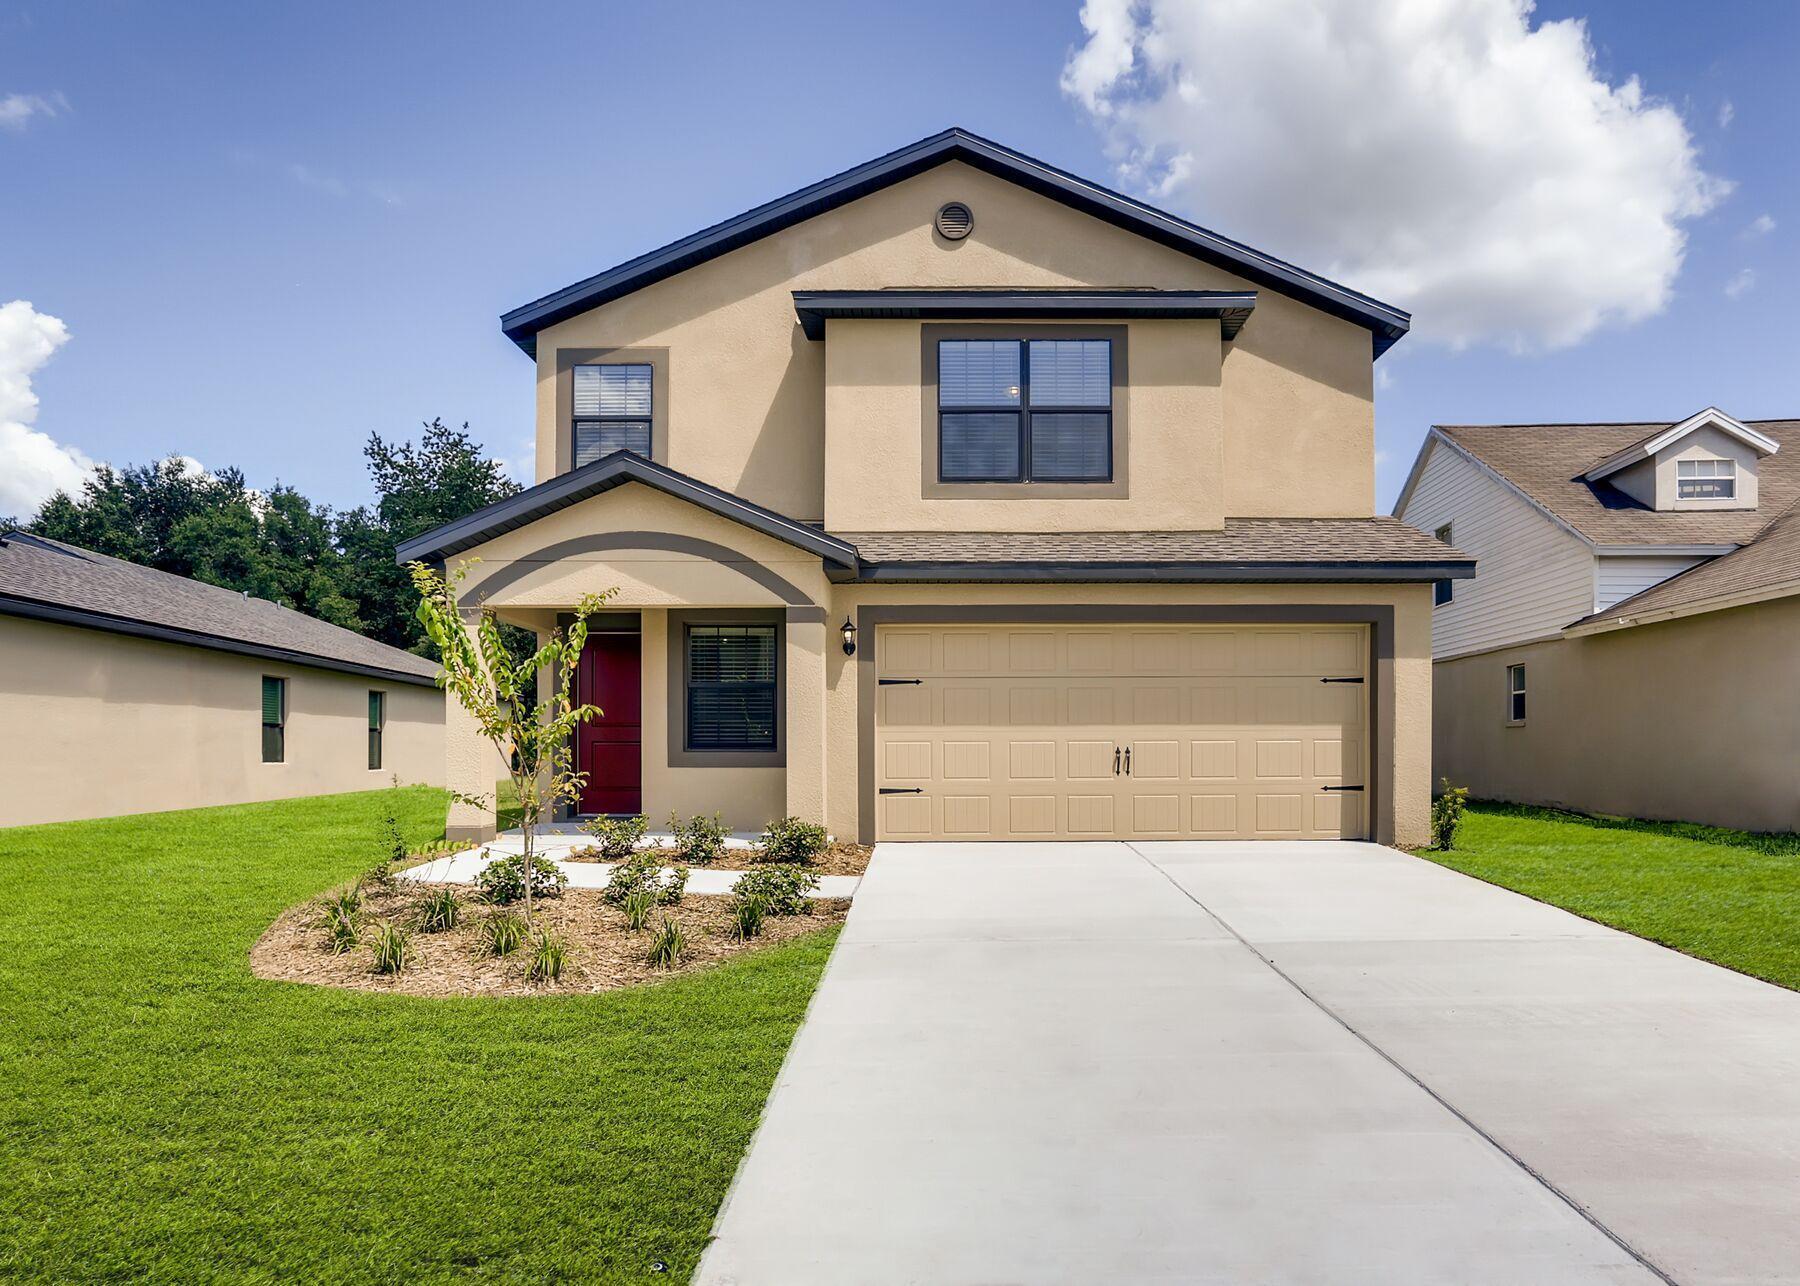 'Poinciana' by LGI Homes in Orlando